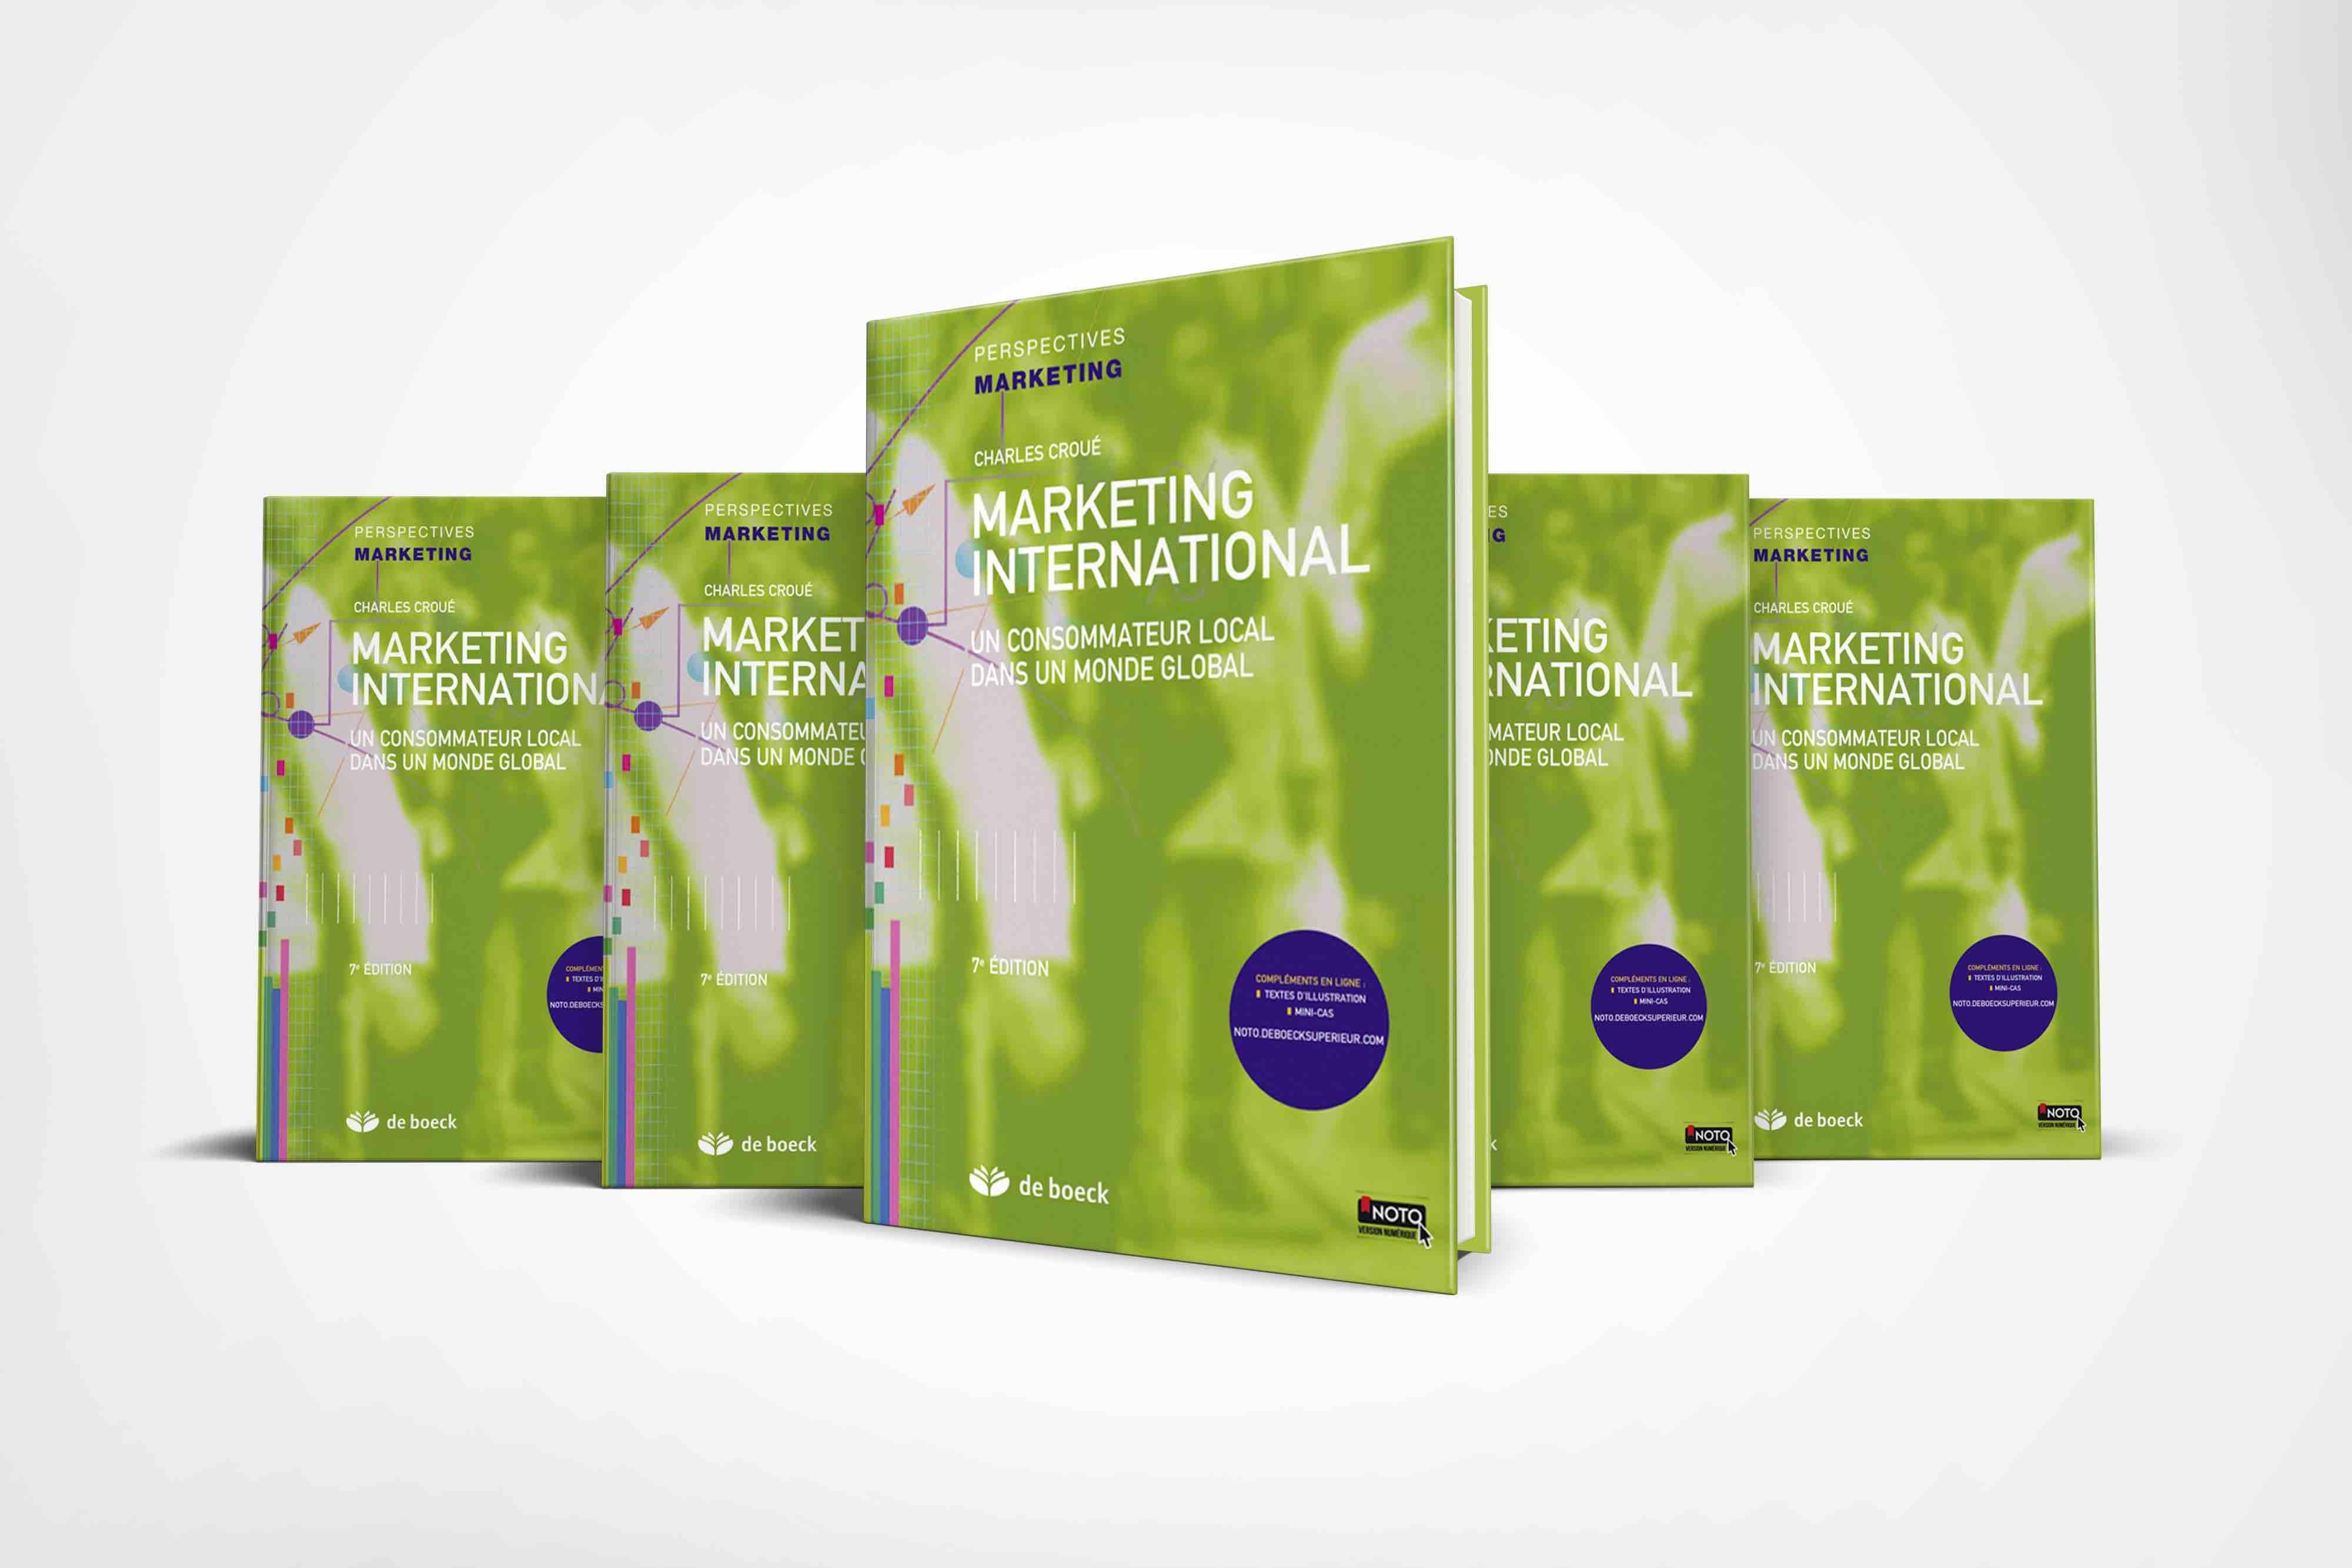 Marketing International : Un consommateur local dans un monde global